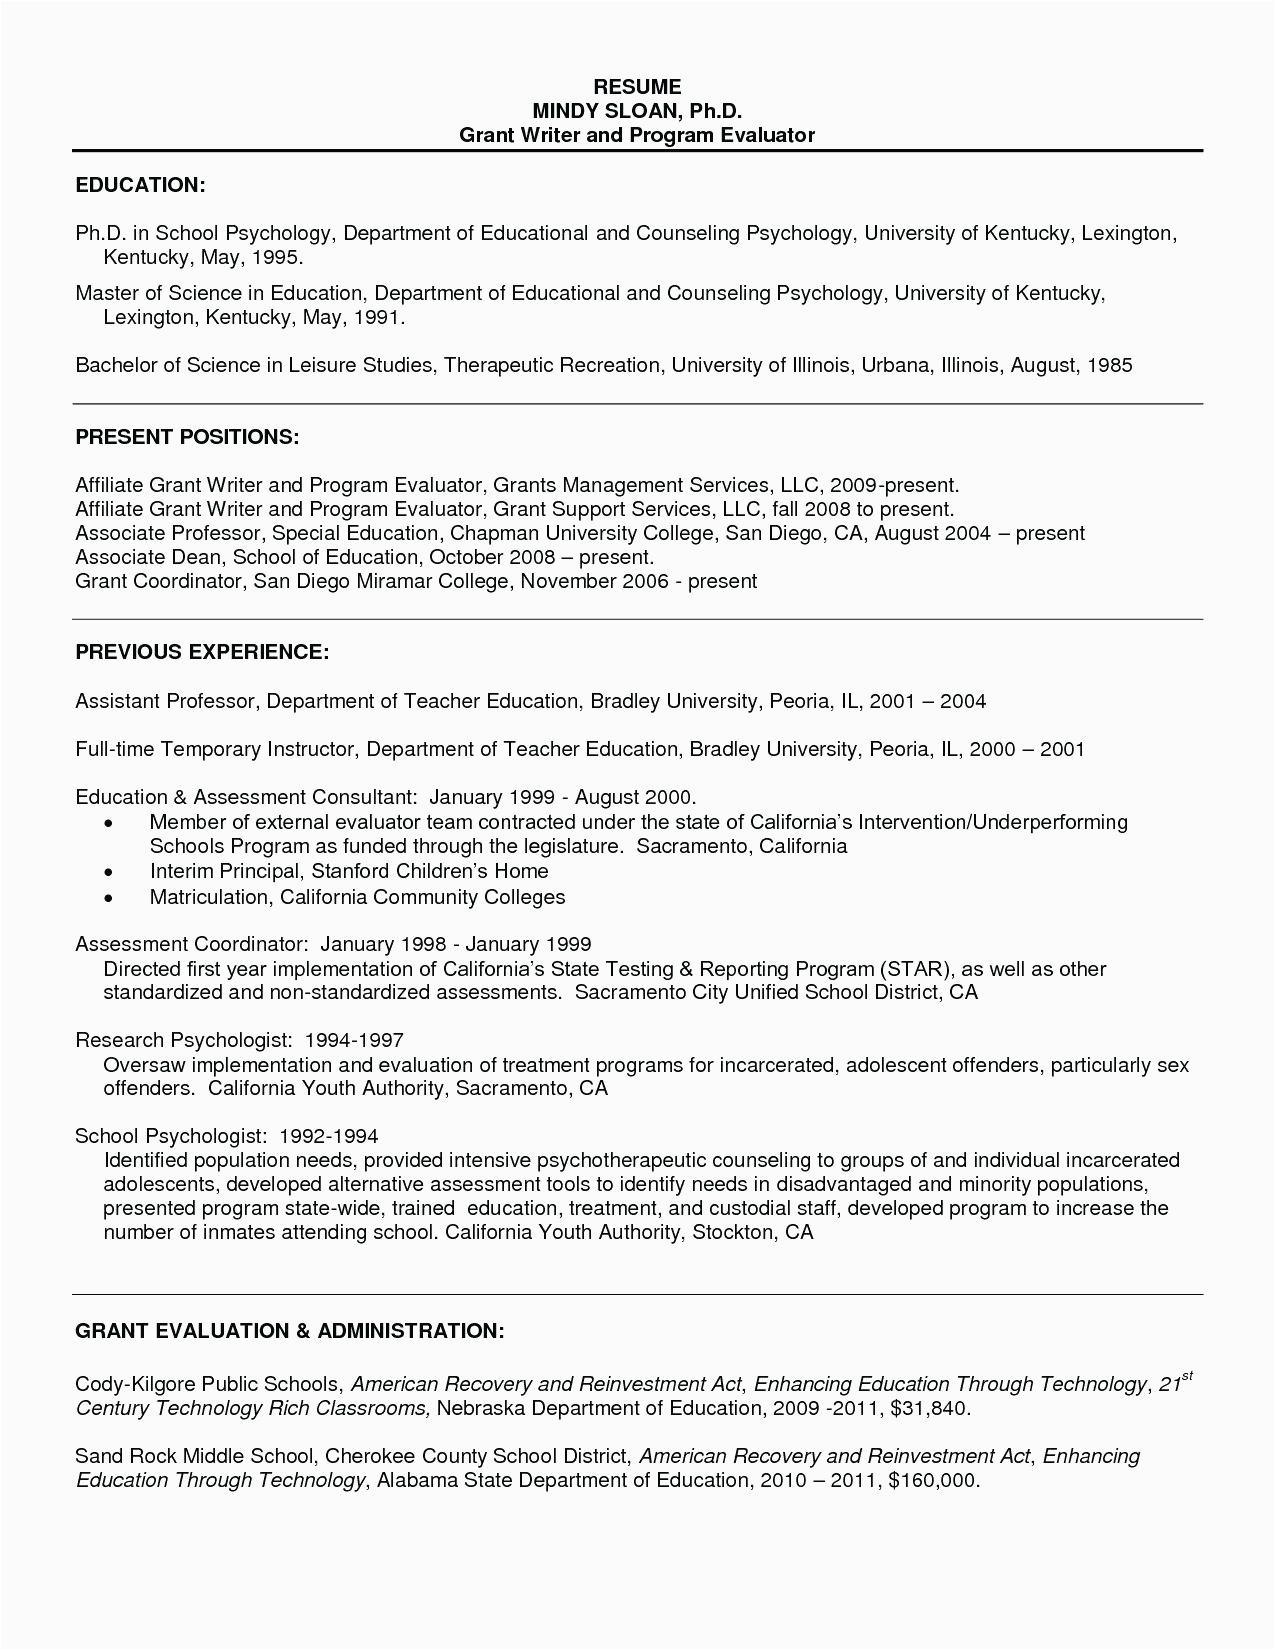 Sample Resume for Master S Admission Grad School Resume Resume Templates for Masters Program